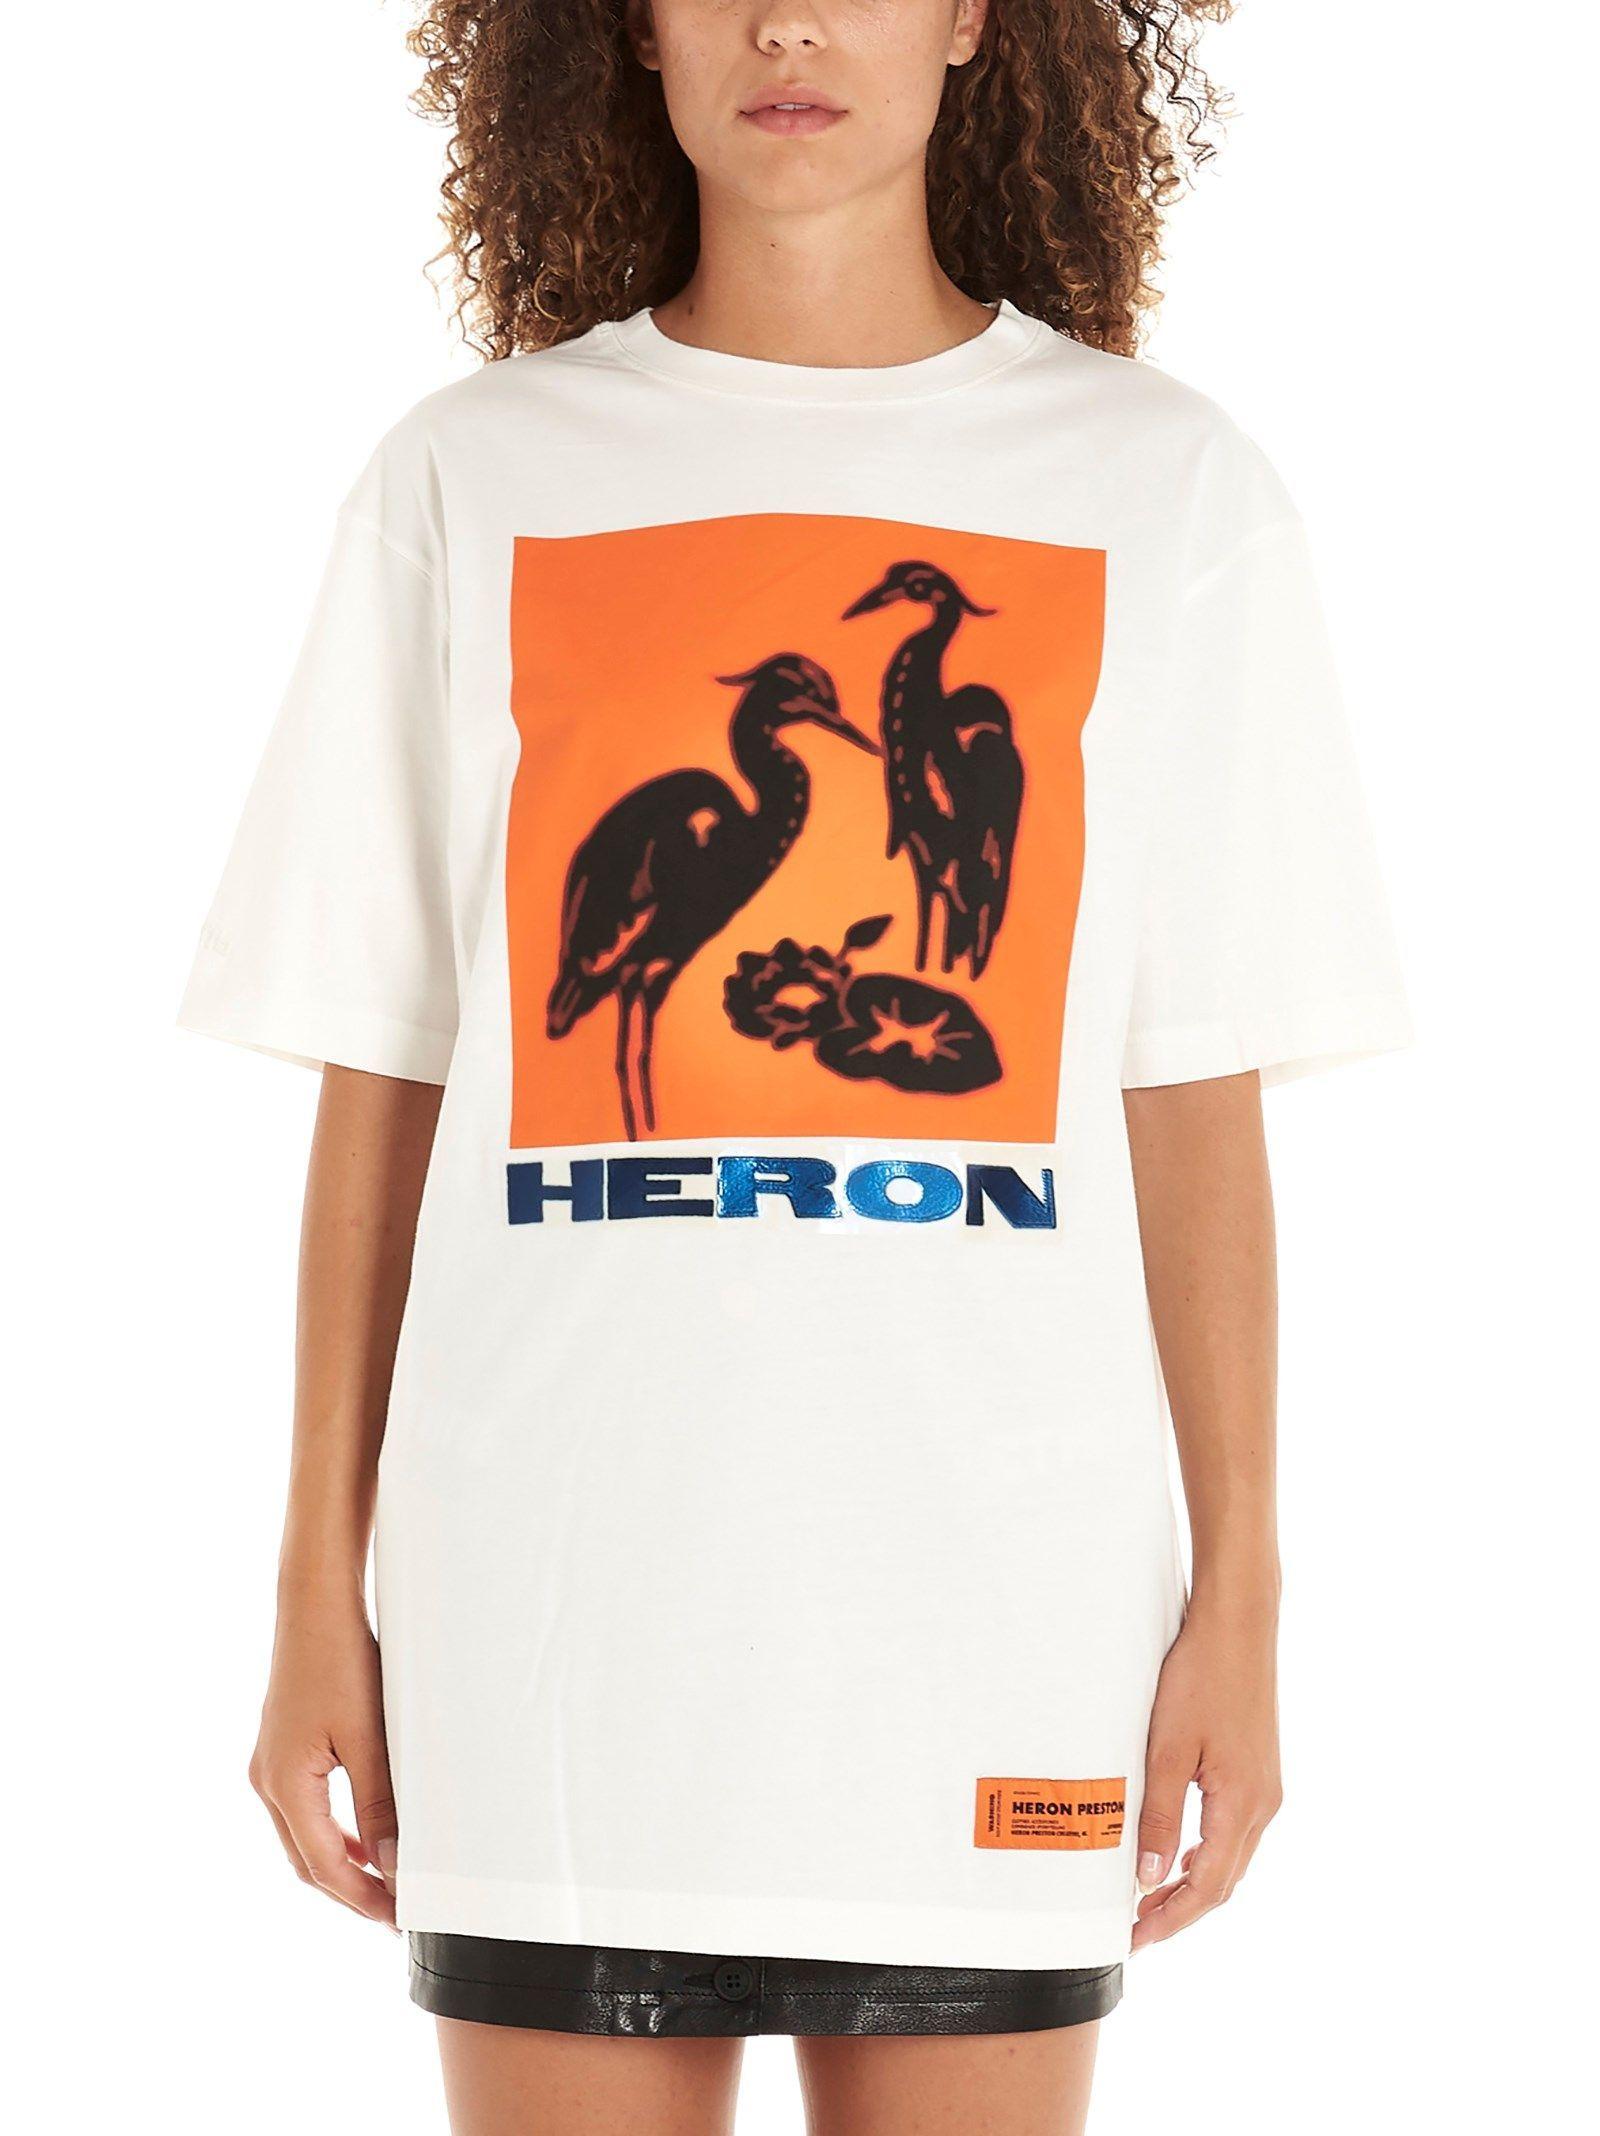 HERON PRESTON WOMEN'S HWAA001E197600010288 WHITE COTTON T-SHIRT